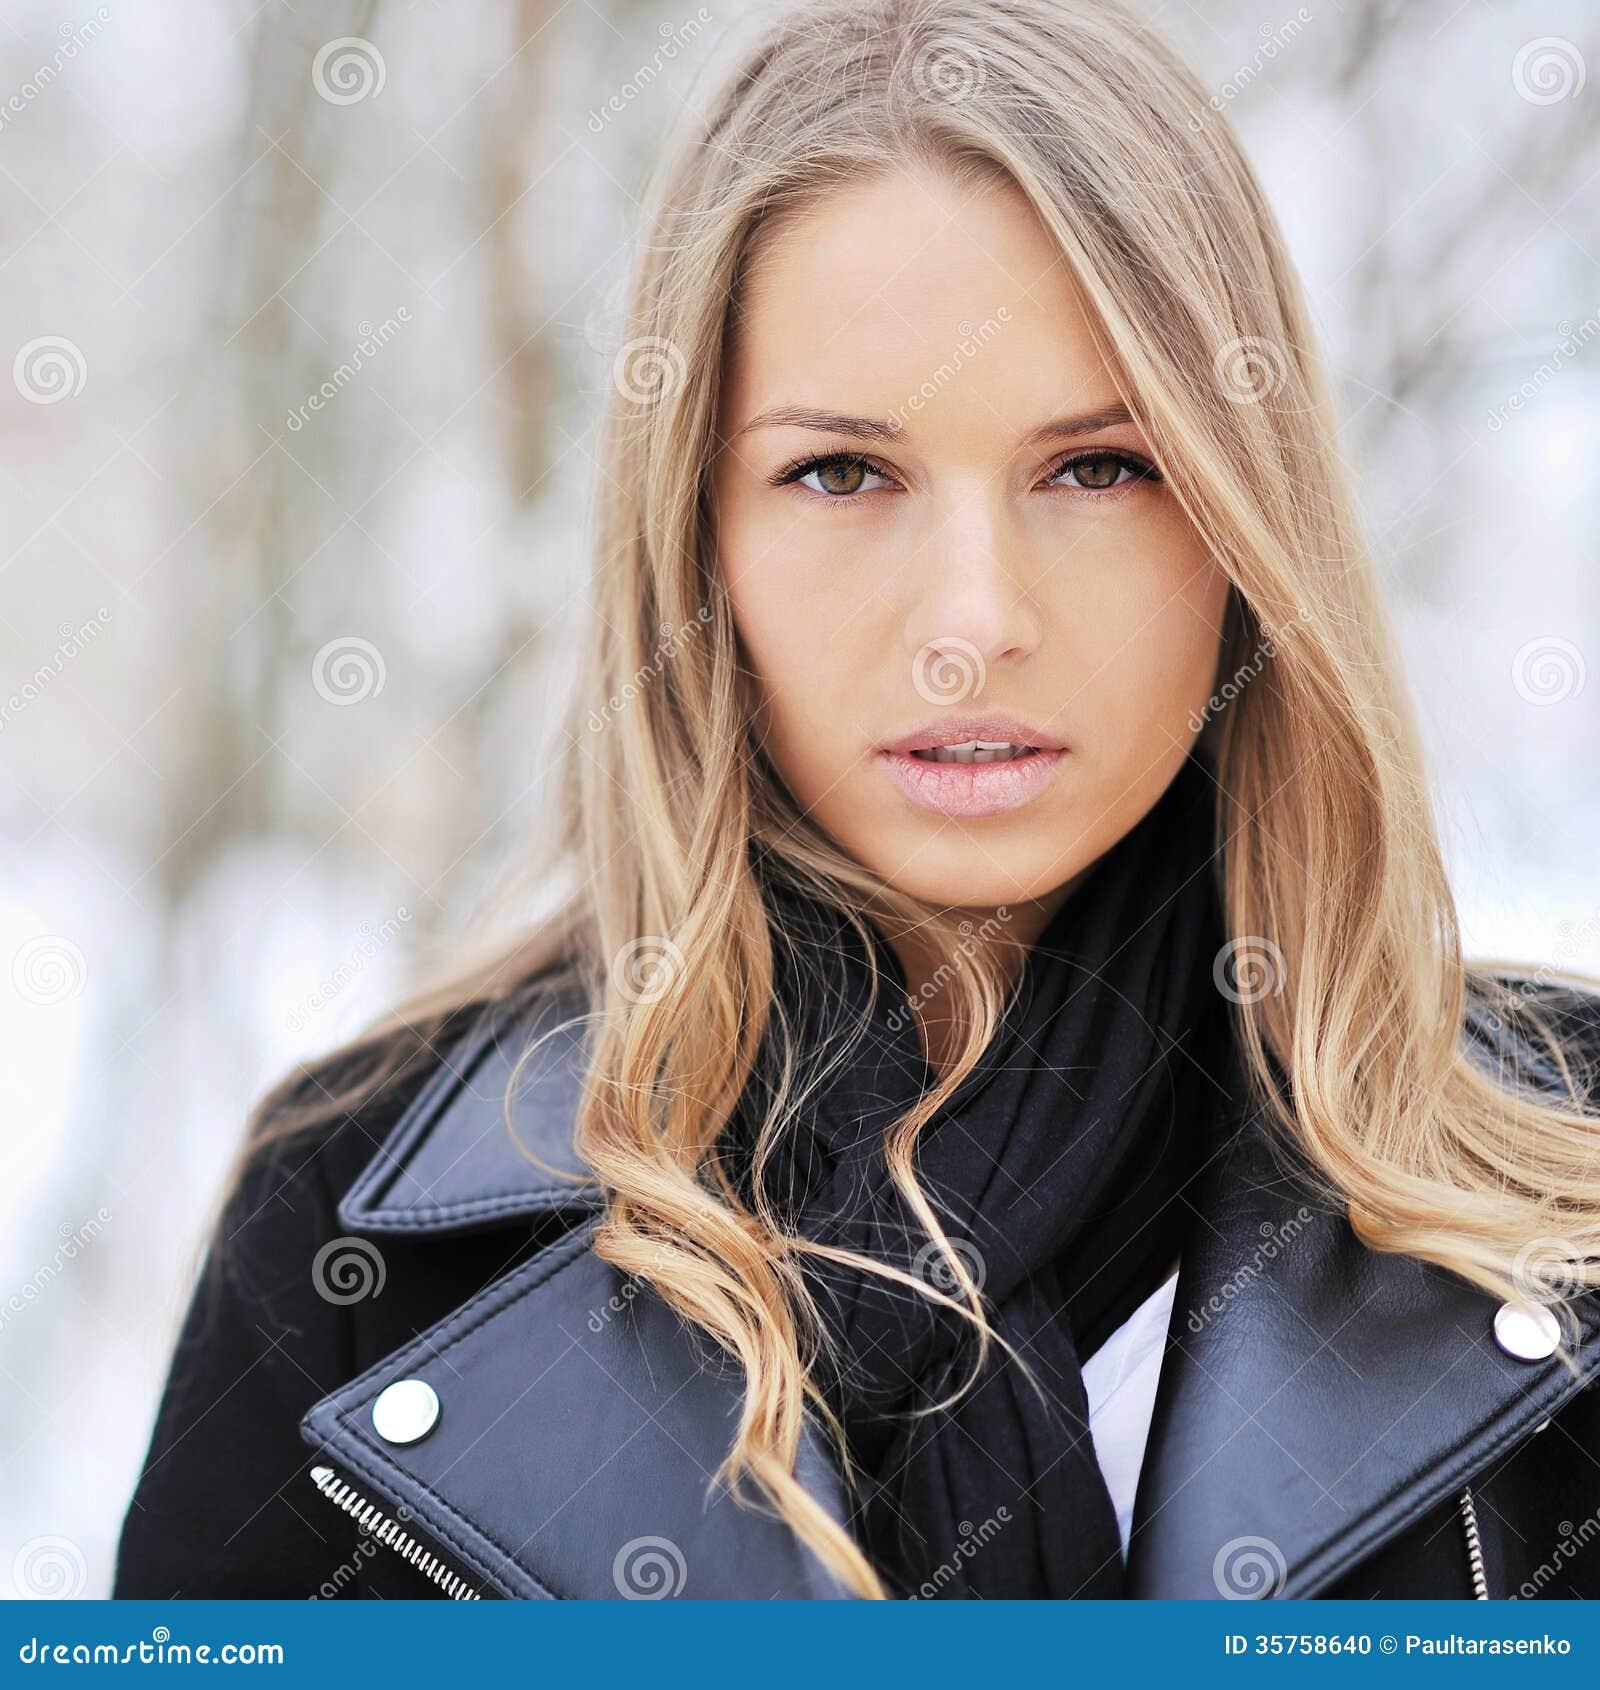 Cara hermosa de la muchacha - ascendente cercano